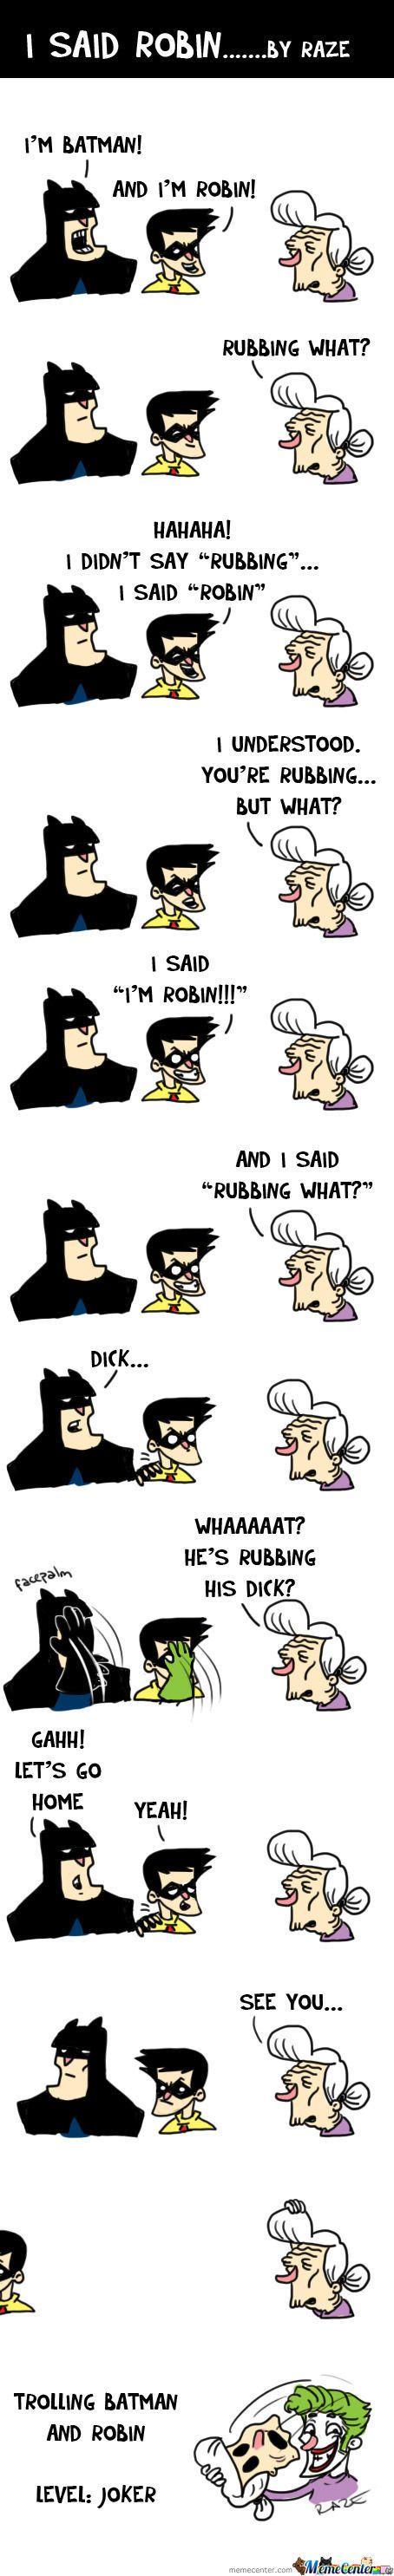 Batman & Rubbing